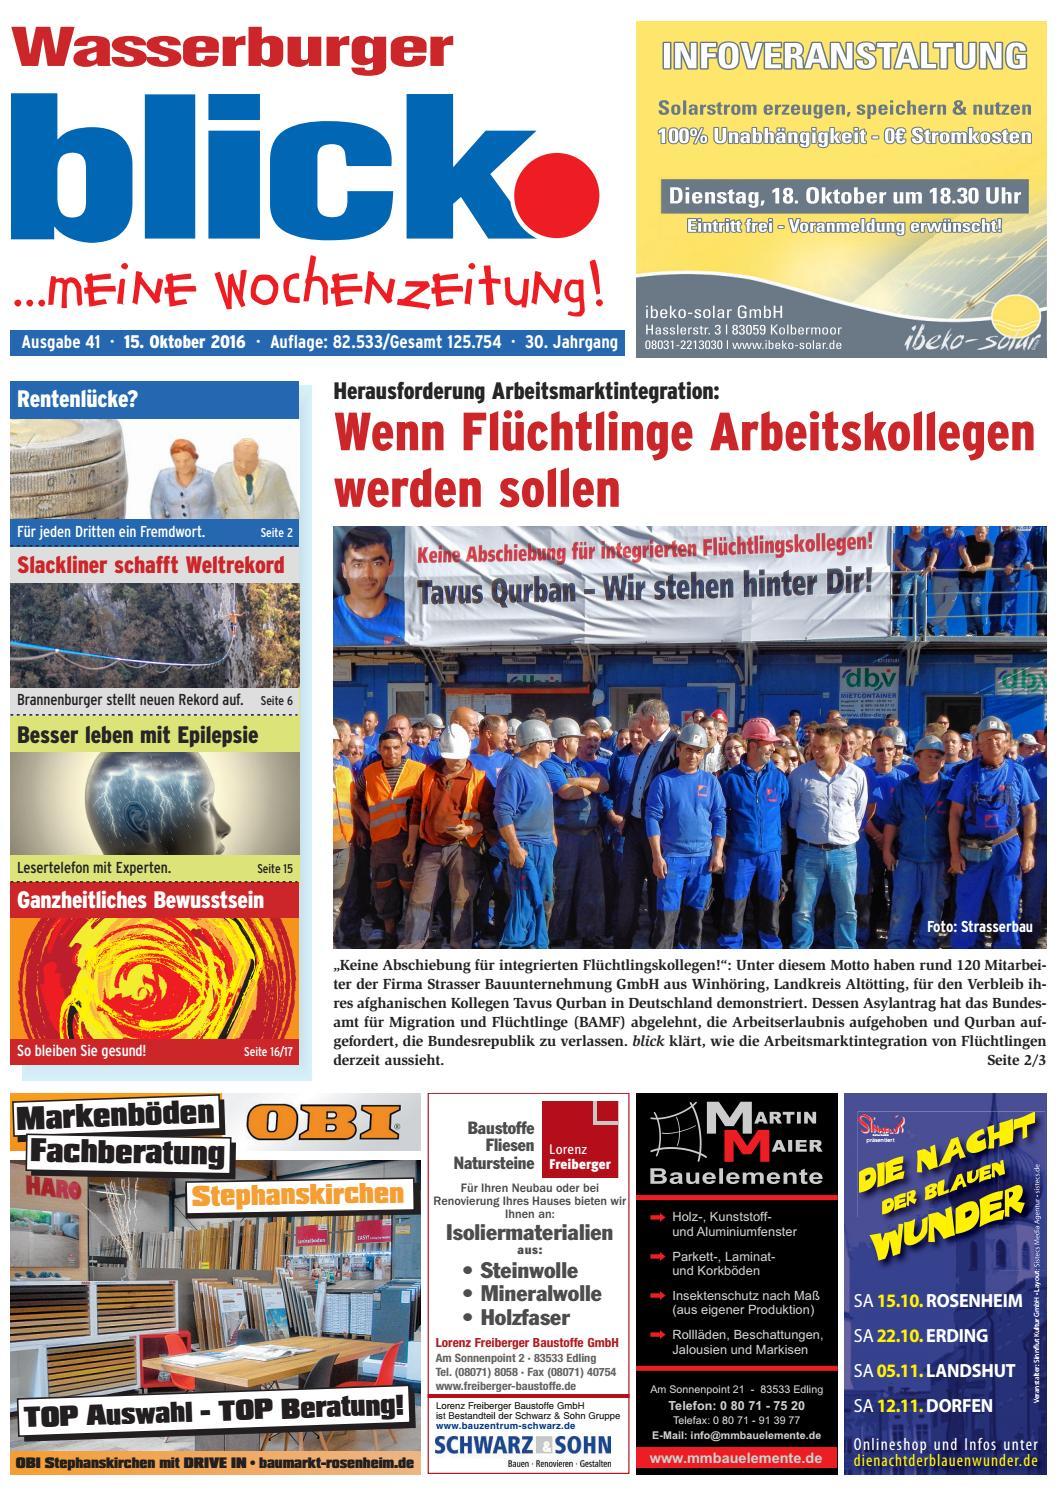 Wasserburger Blick Augabe 41 2016 By Blickpunkt Verlag